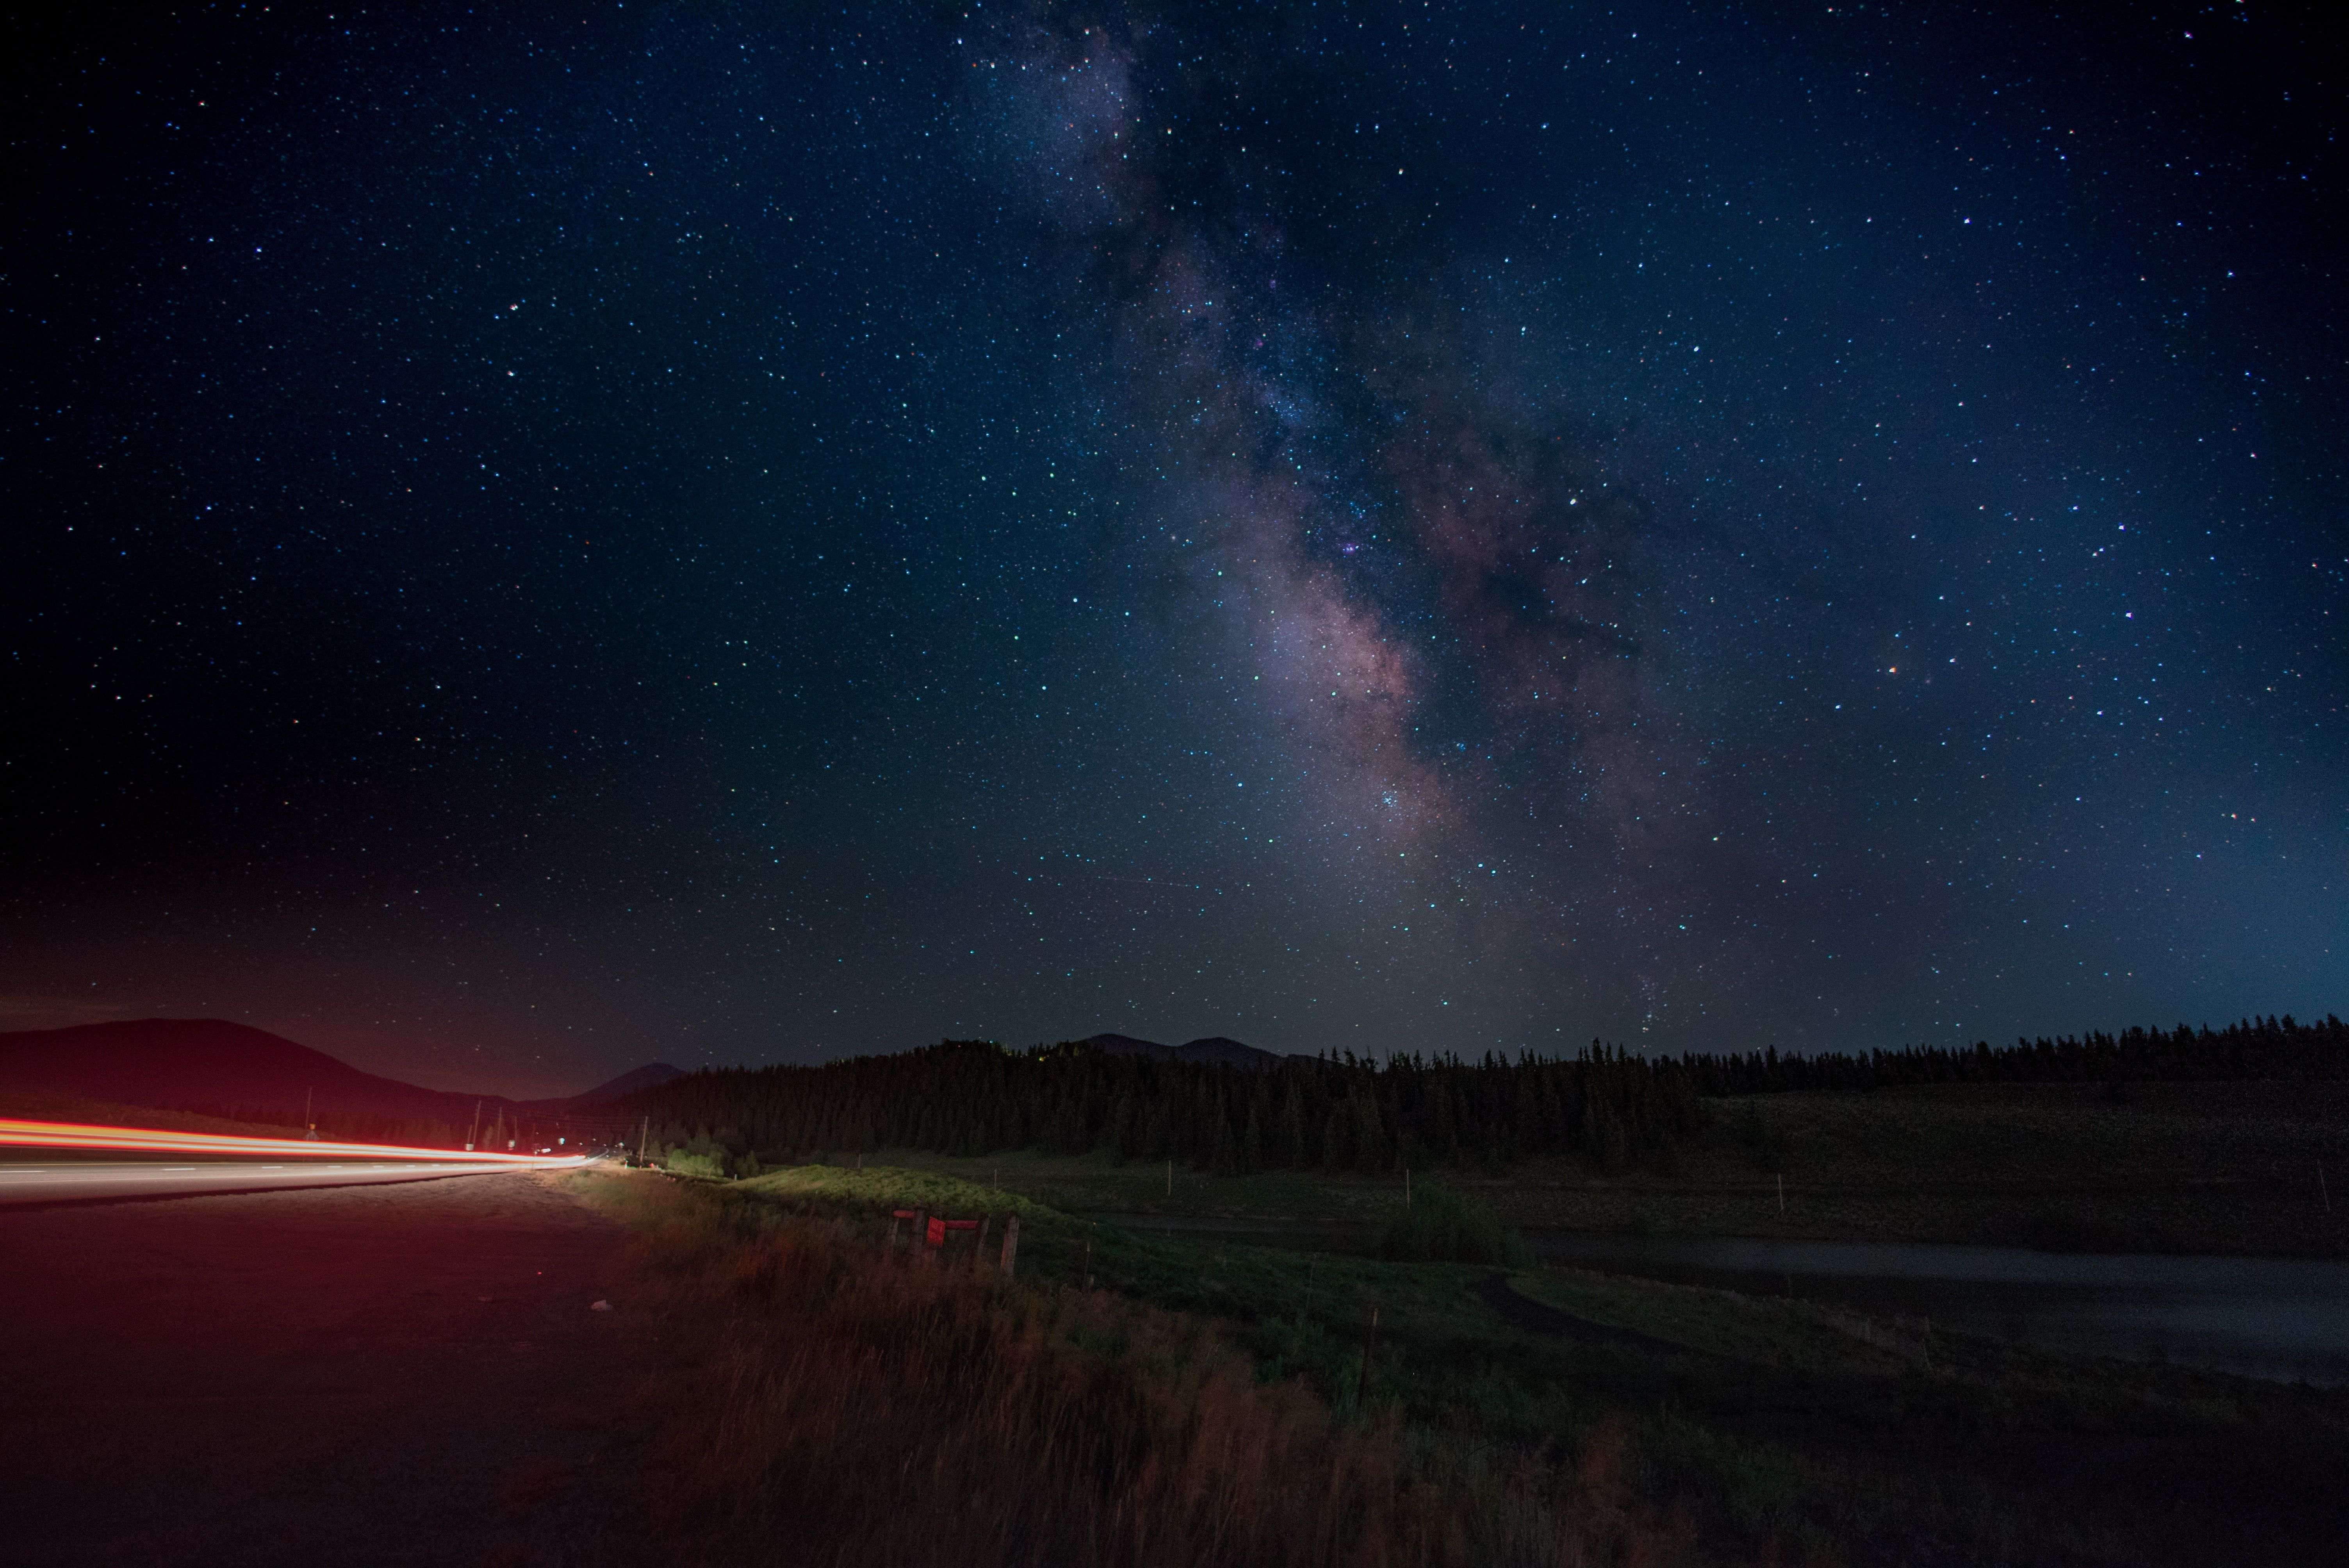 Milky Way Galaxy At Nighttime Road Starry Night Night Sky Lights Car Milky Way Long Exposure Light Trails 5k In 2020 Milky Way Galaxy Milky Way Starry Night Sky